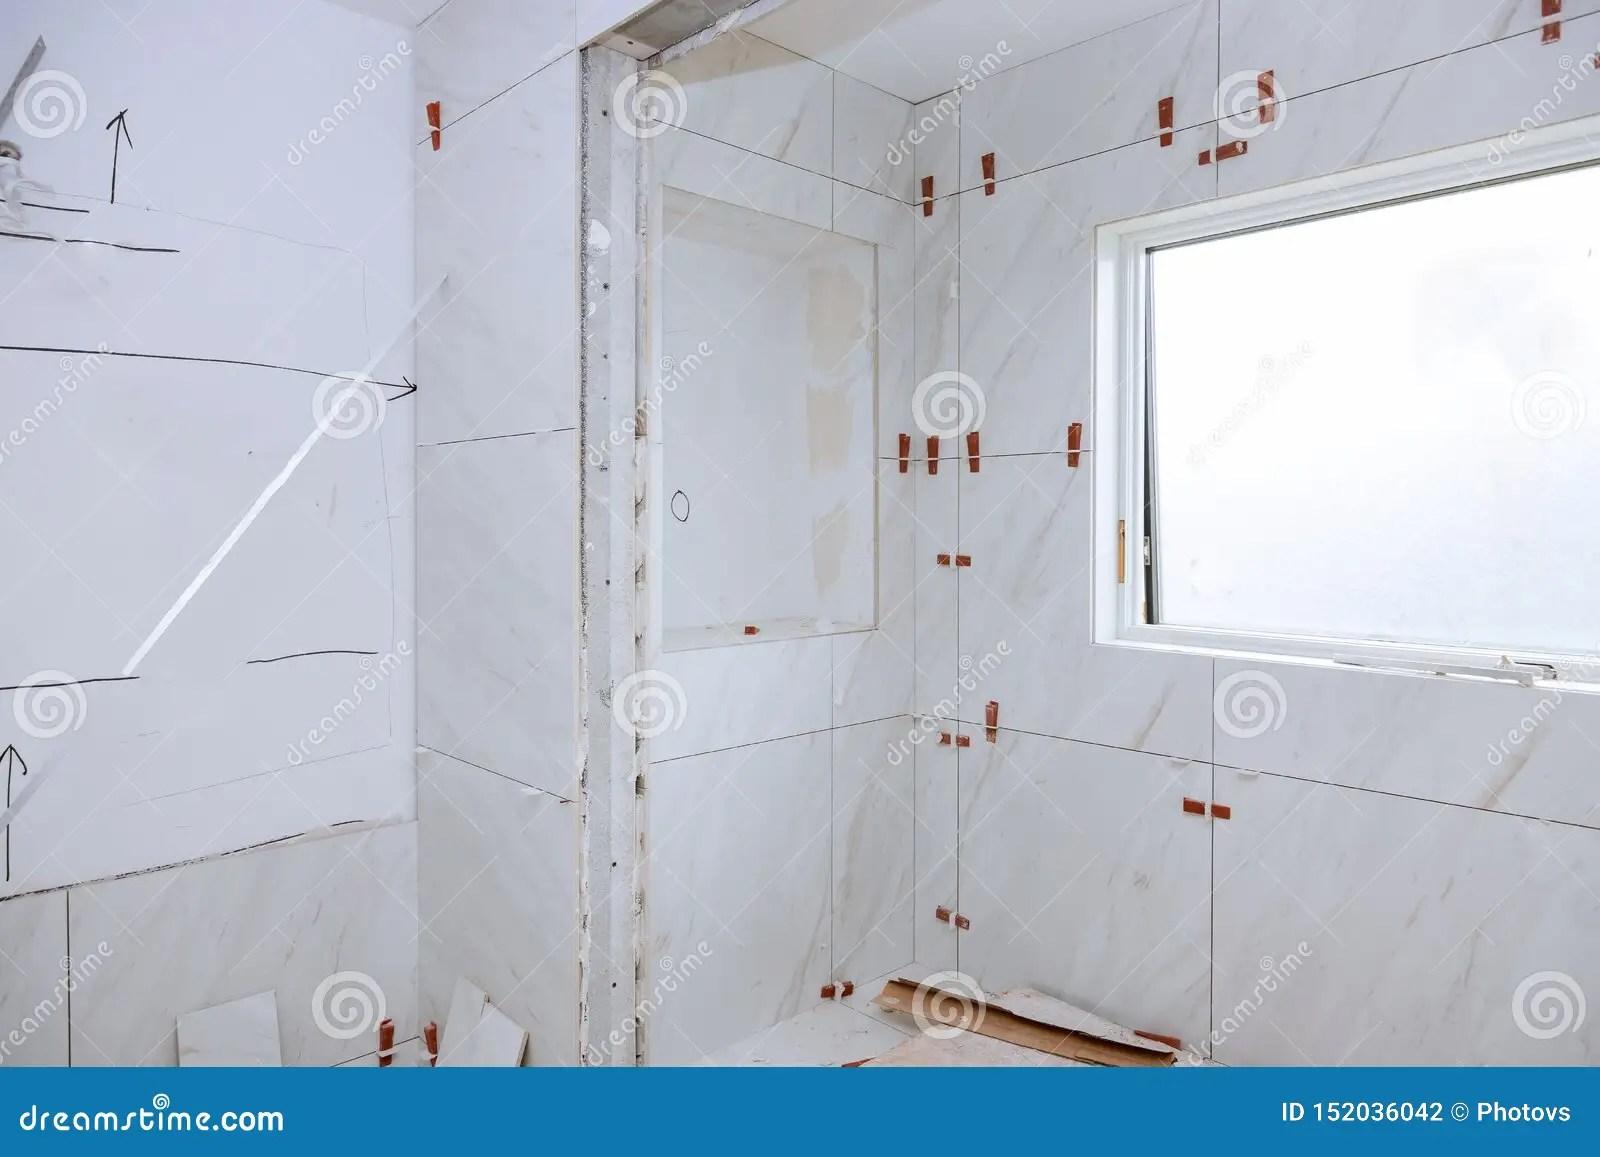 https www dreamstime com spreading wet mortar applying tiles bathroom tile work laying image152036042